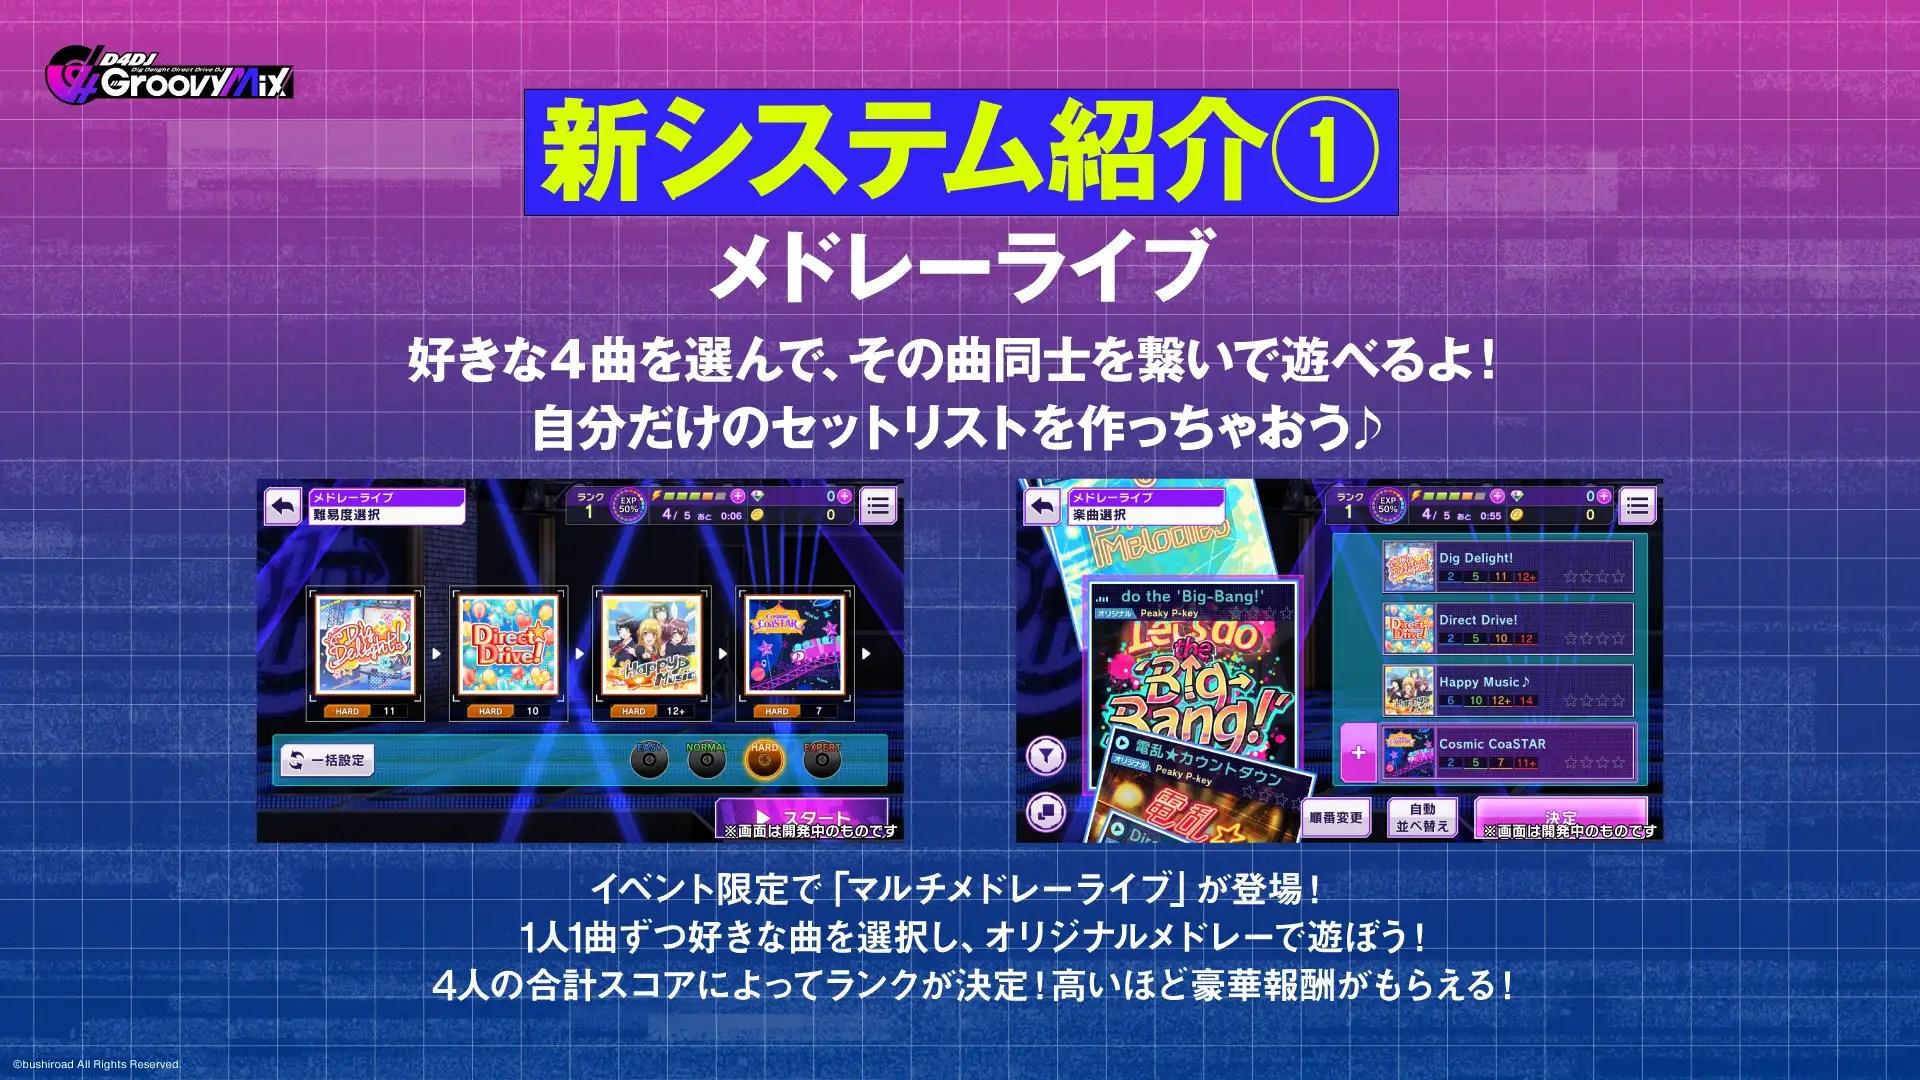 《D4DJ Groovy Mix》發售日確定 線上發佈會公開多頂新資訊 – Great Game 亞洲遊戲網